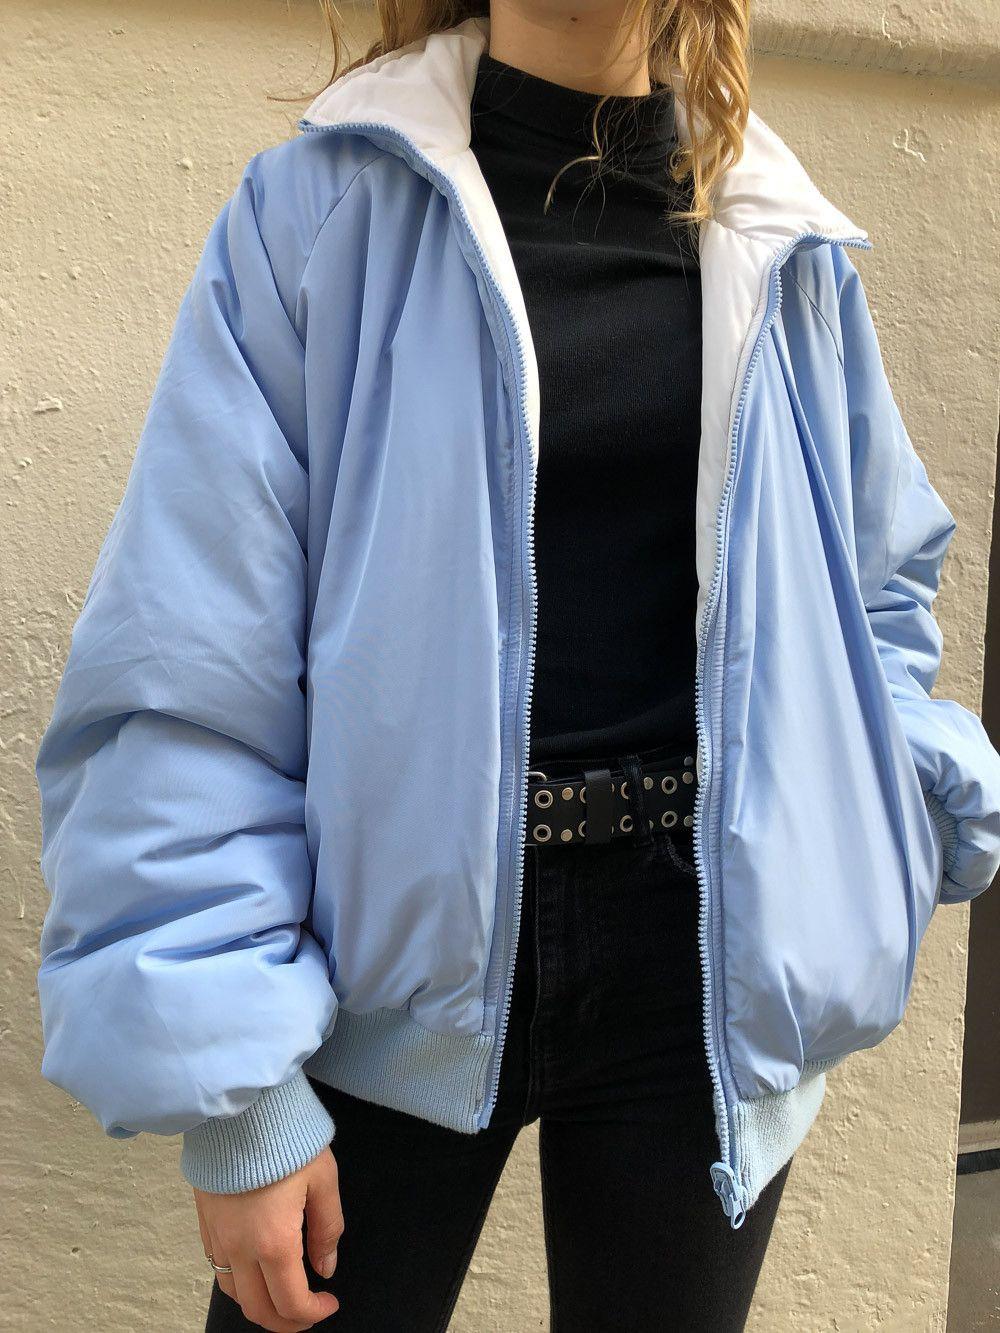 7b47e7d9887d Faith Puffer Jacket - Jackets - Outerwear - Clothing Brandy Melville Jacket